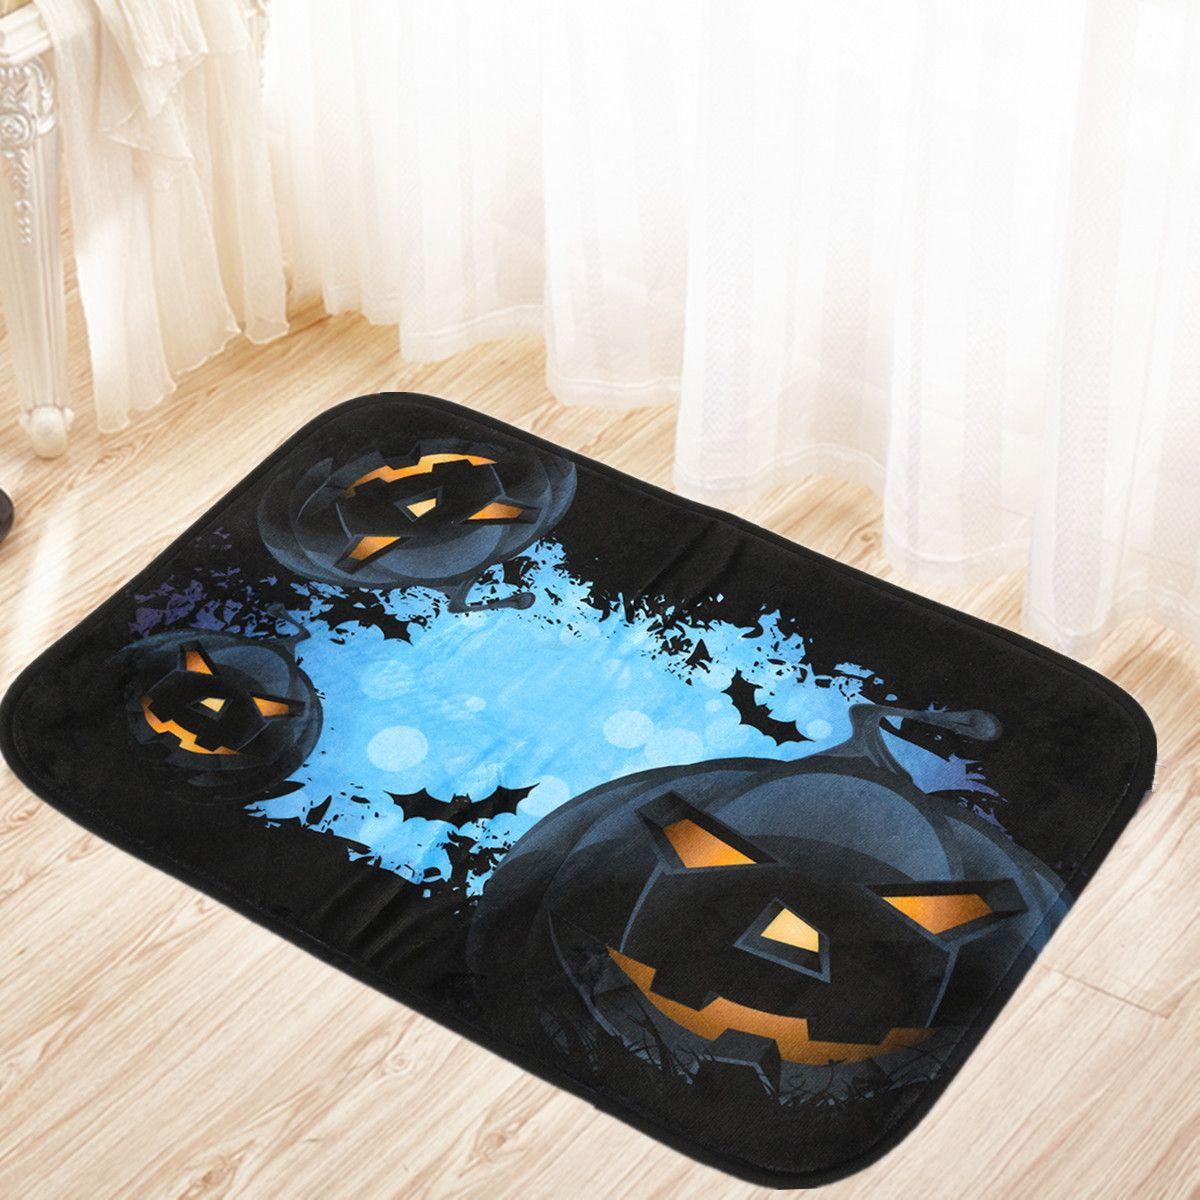 40x60cm De Calabaza De Halloween Antideslizante Ba O Estera De  ~ Suelos Antideslizantes Para Cuartos De Baño